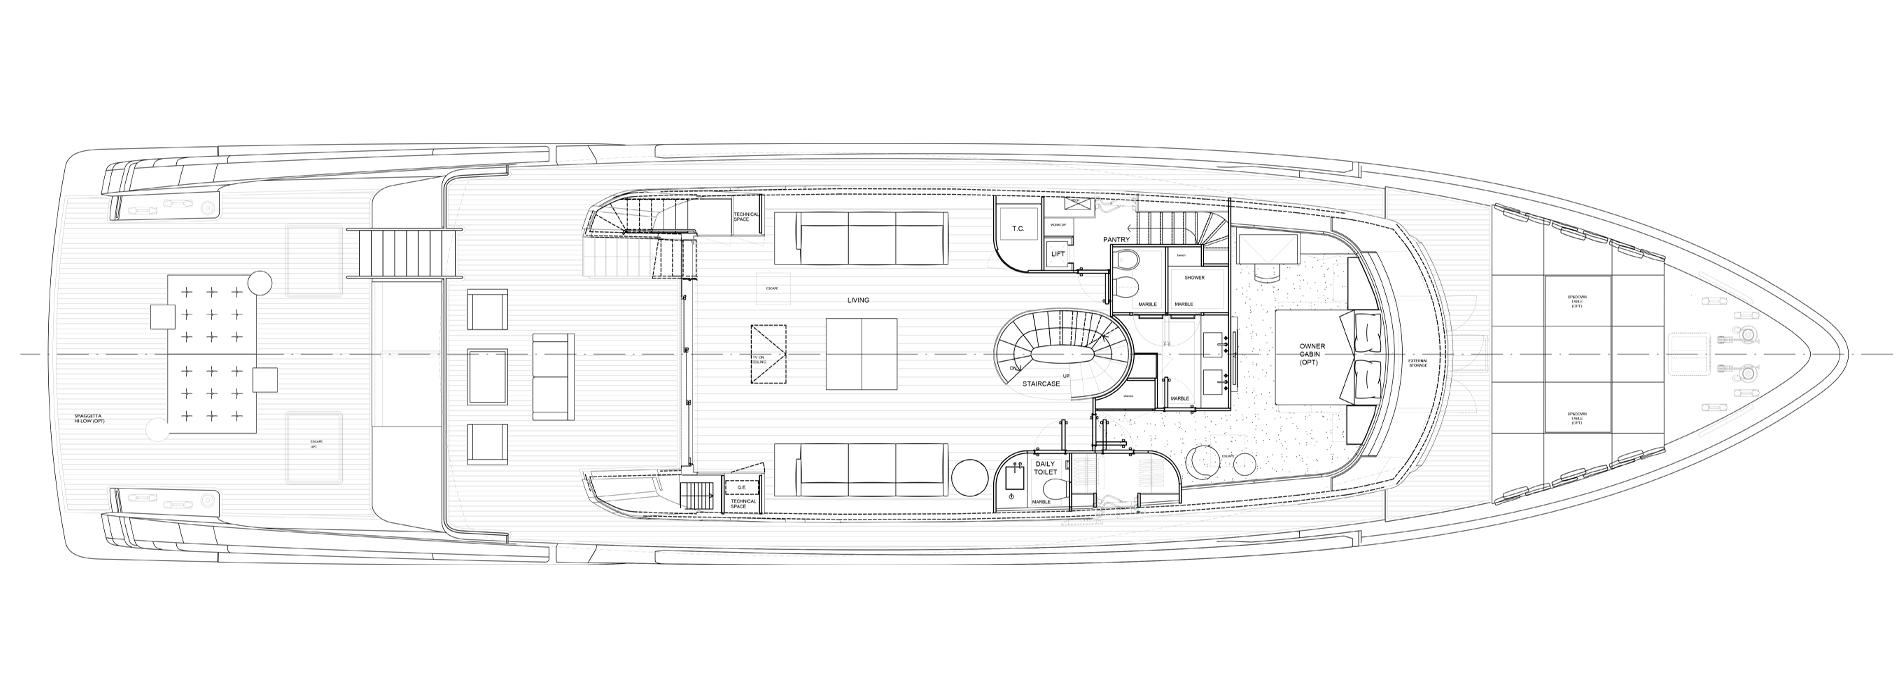 Sanlorenzo Yachts SX112 主甲板 版 C